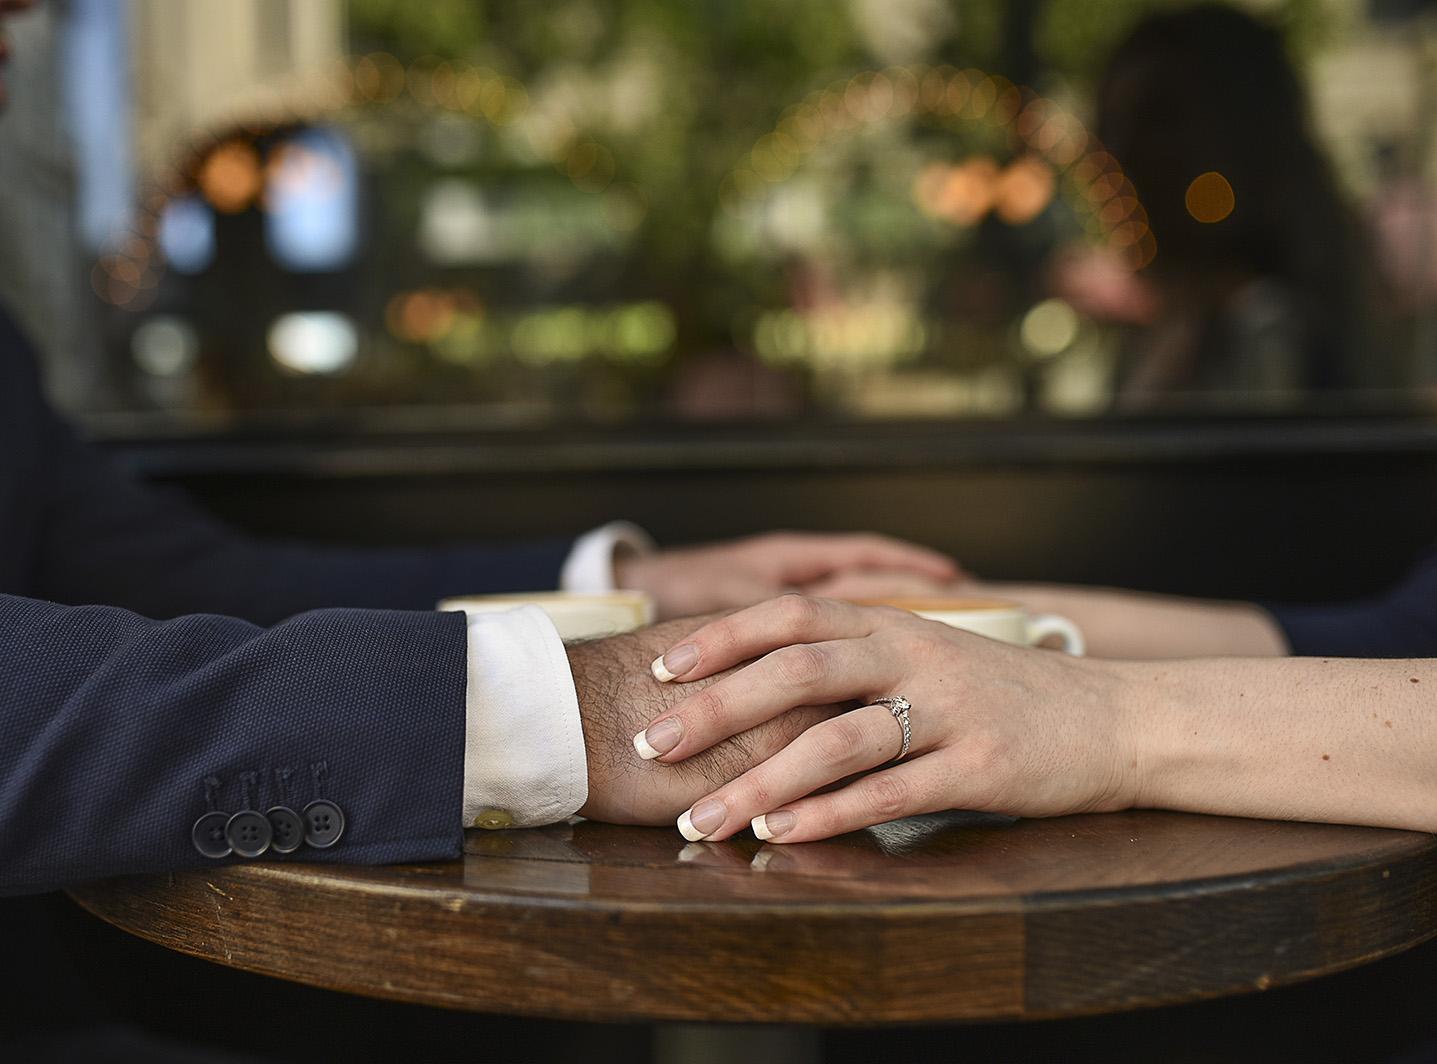 Houston honeymoon cafe creative modern engagement ring Kate_Lawrence_054sm.jpg